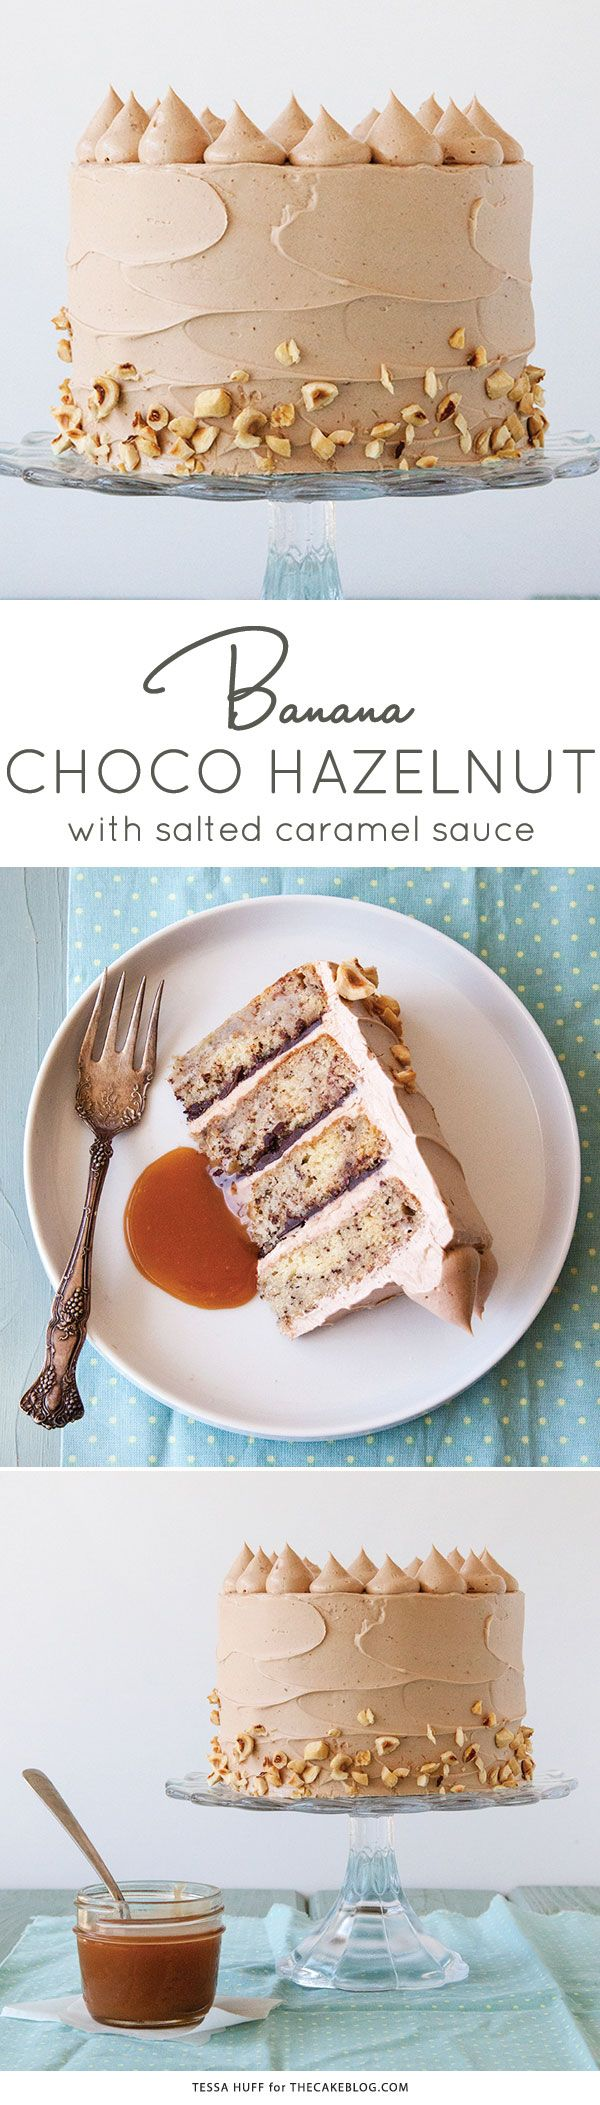 Banana Chocolate Hazelnut Cake | Recipe by Tessa Huff for https://TheCakeBlog.com